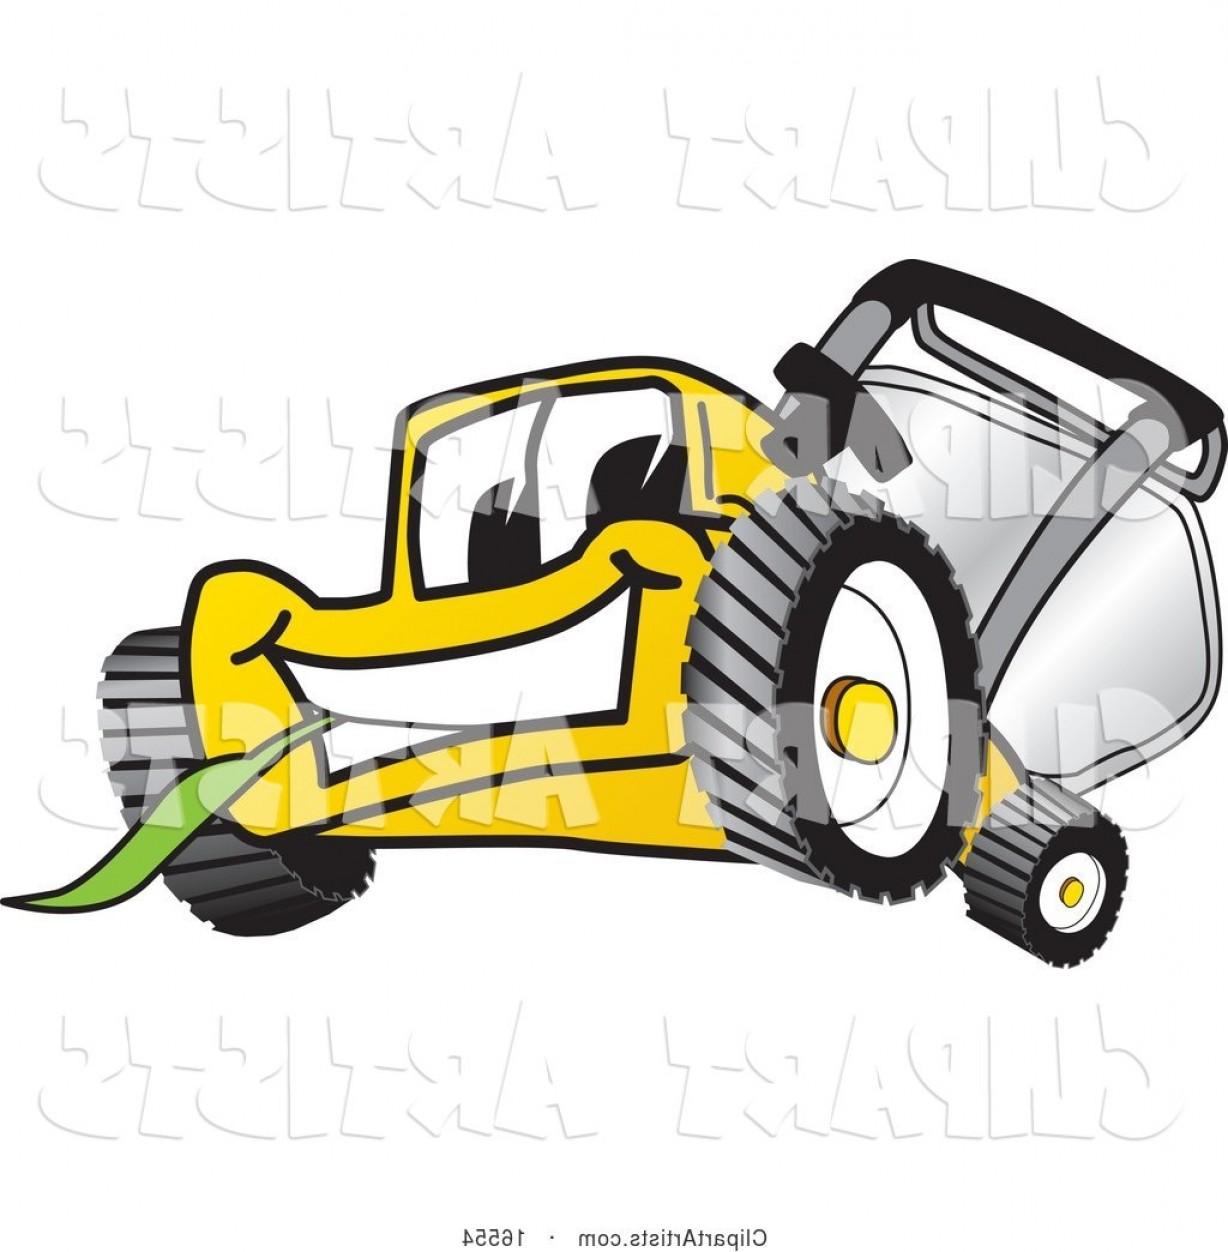 Facing clipart clipart transparent library Vector Clipart Yellow Lawn Mower Mascot Cartoon Character Facing ... clipart transparent library